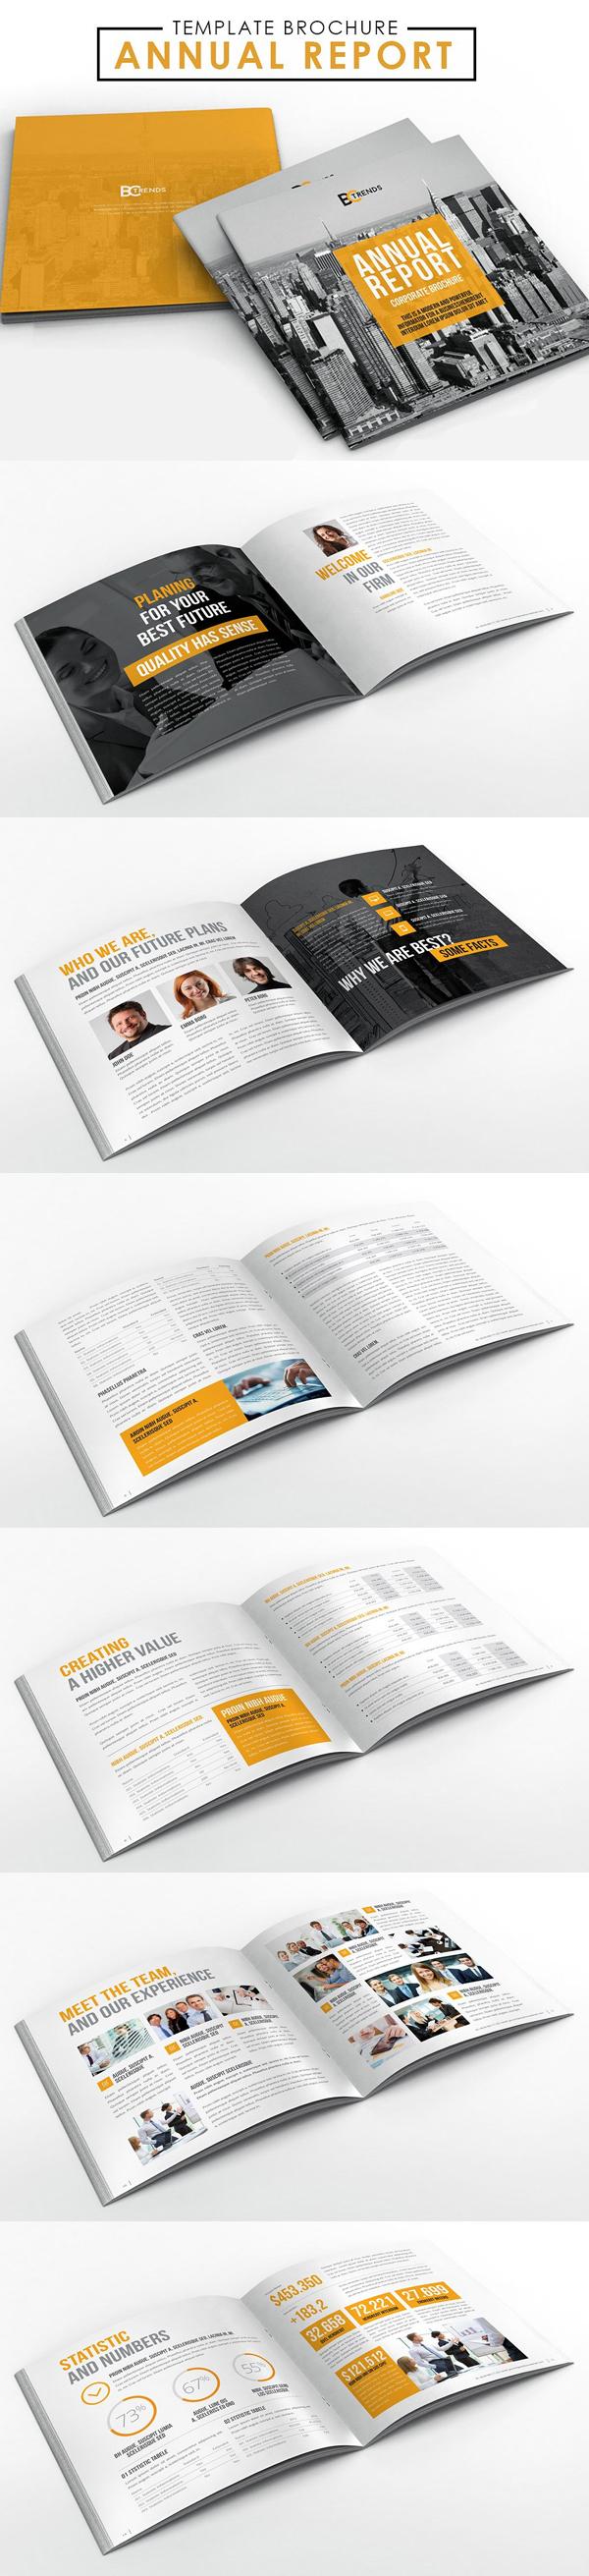 100 Professional Corporate Brochure Templates - 17